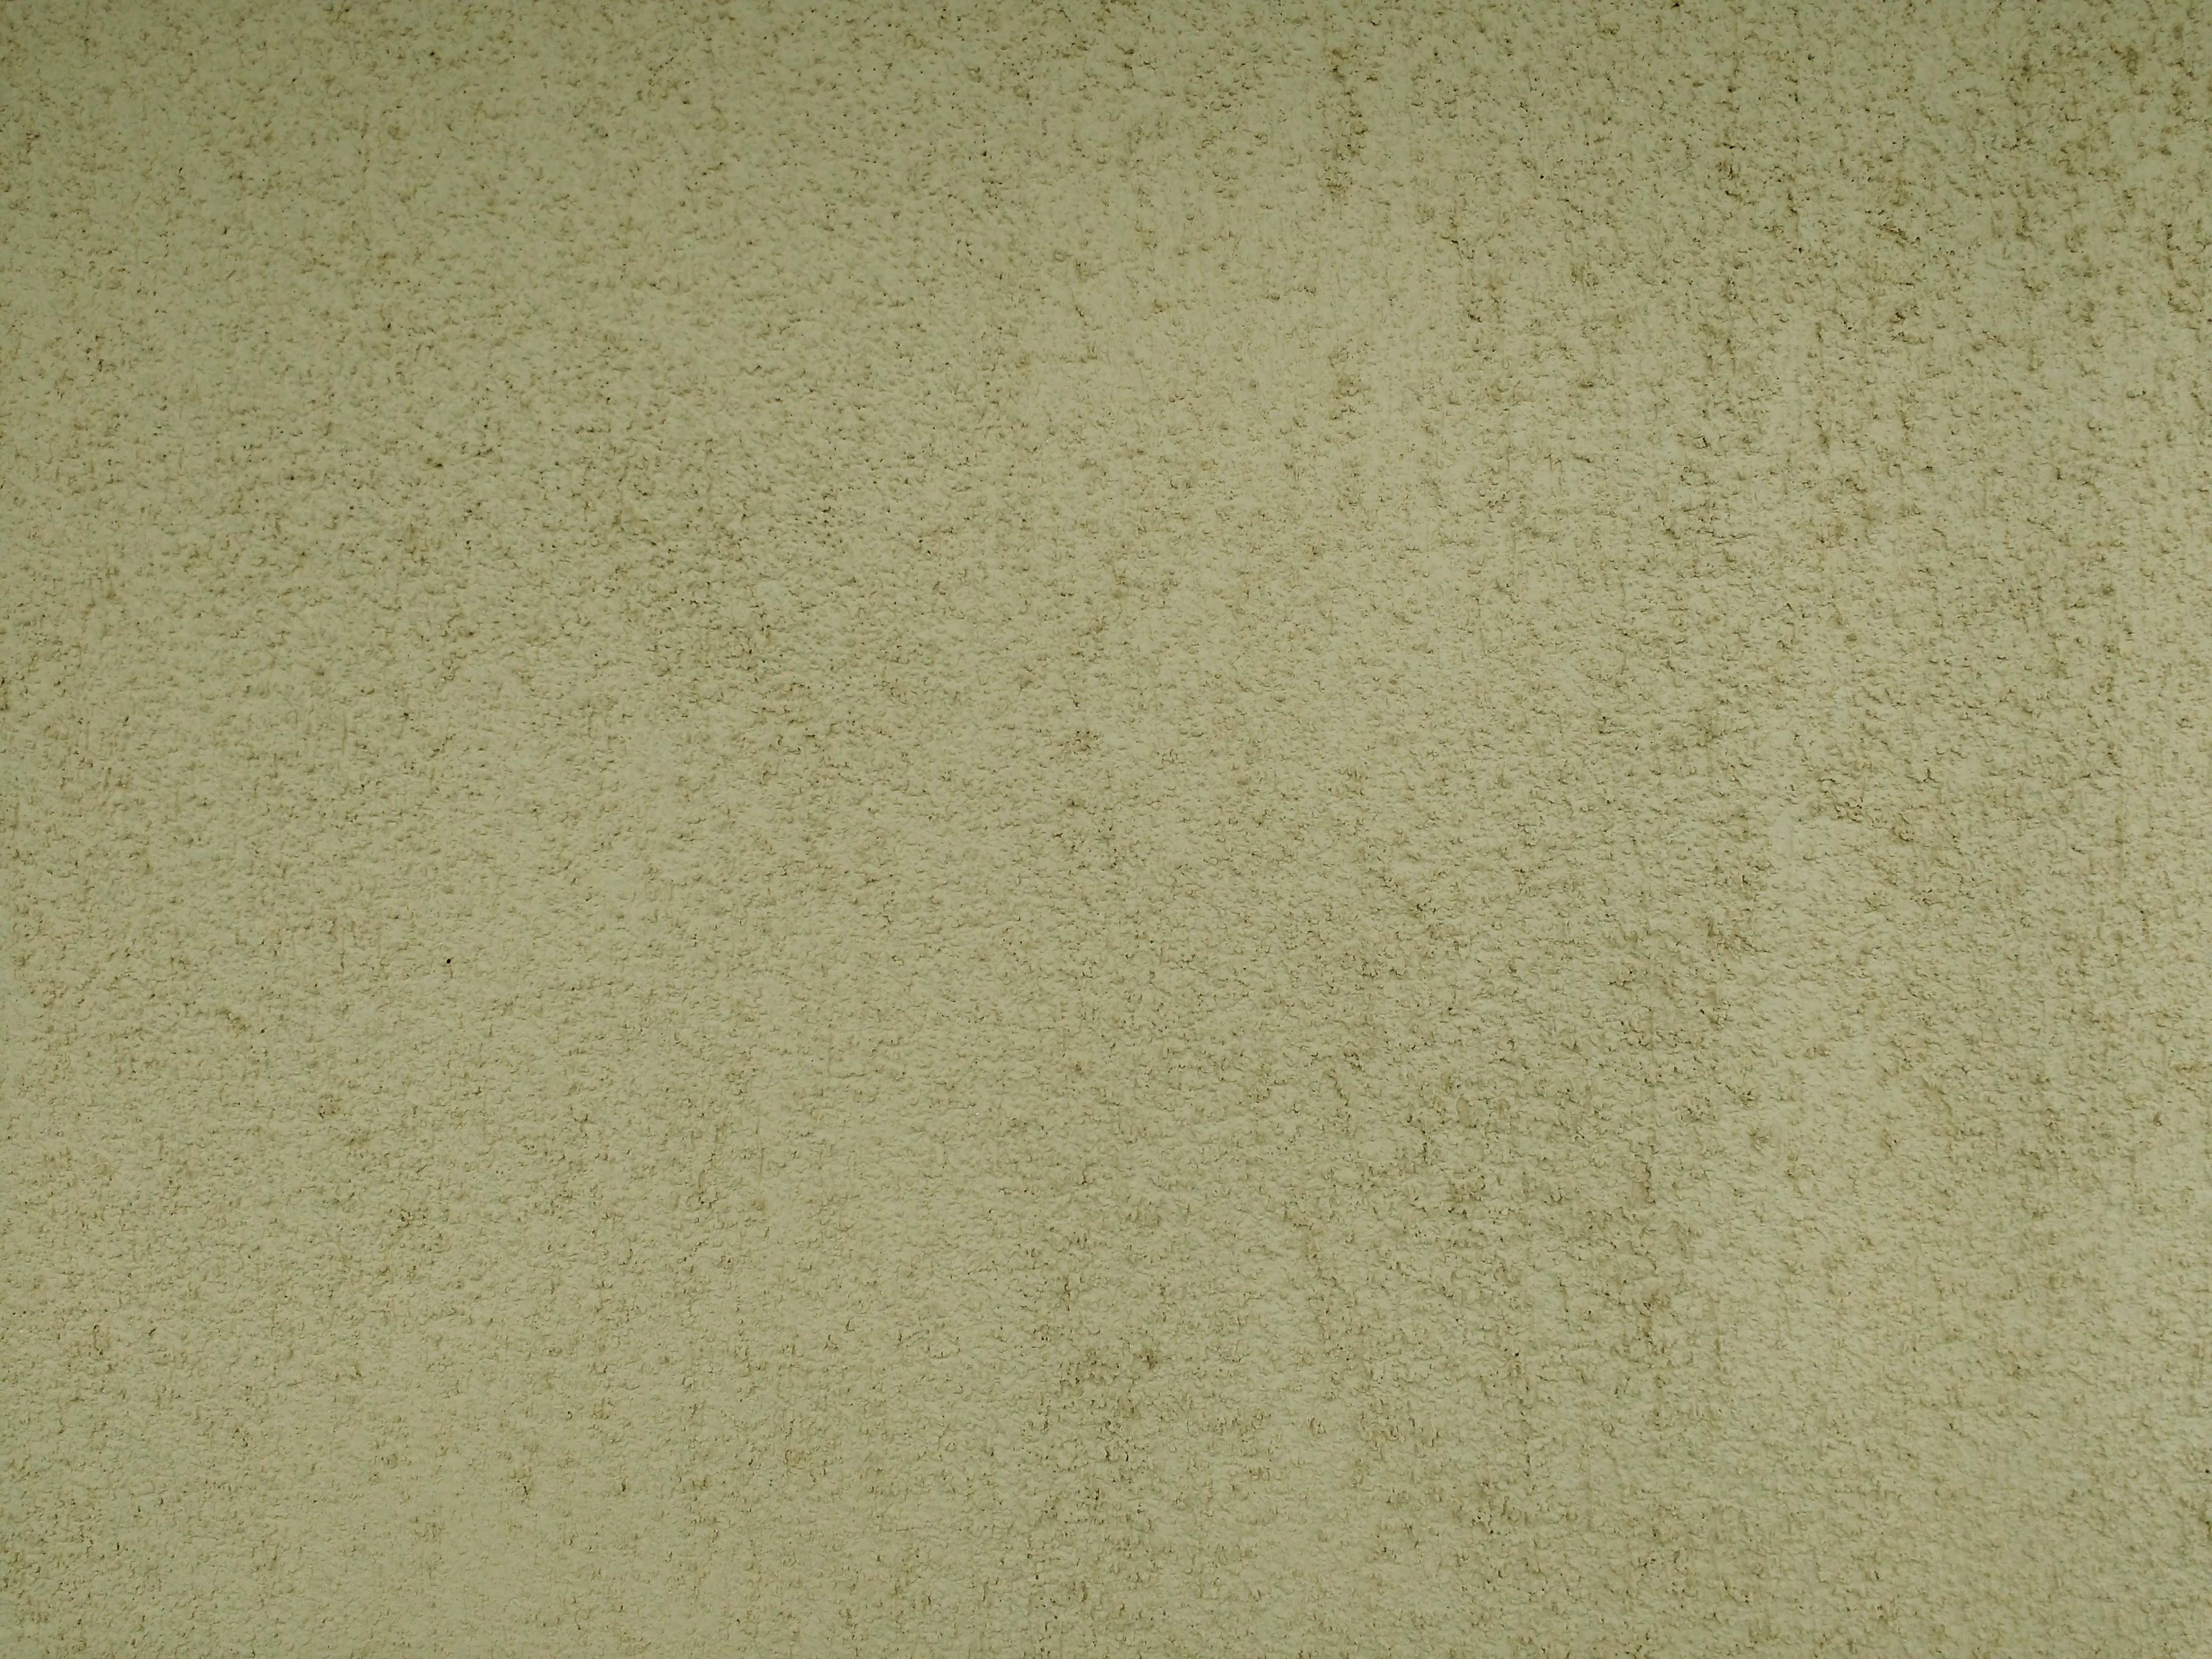 Olive Green Background Free Stock Photo - Public Domain